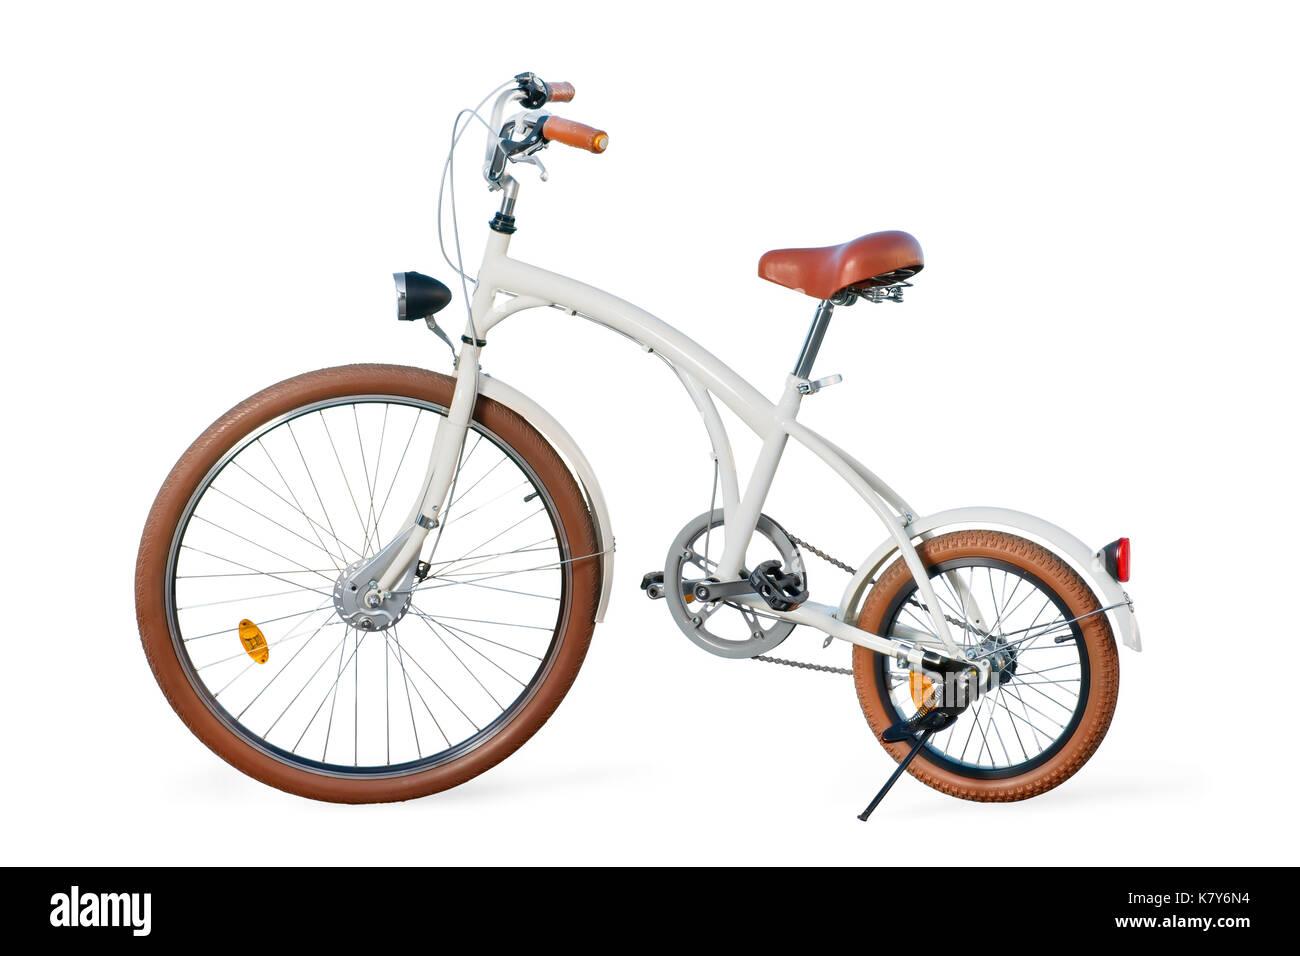 White retro stylized custom cruiser bike. Isolated on white, clipping path included - Stock Image